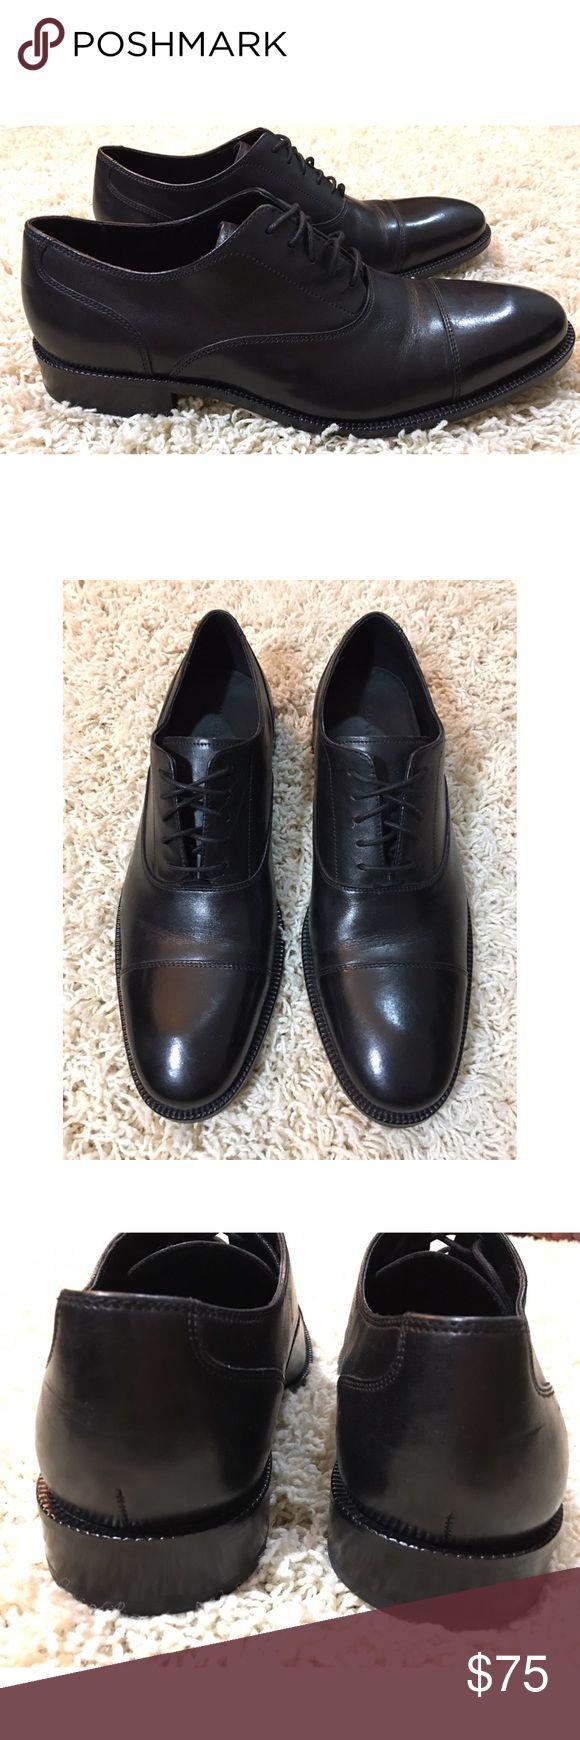 Men's Cole Haan Oxford Dress Shoes A gorgeous pair of Men's Cole Haan cap toe dress shoes. Size 10 1/2 Medium. Color is Black. Excellent Like New condition. 110716GW1220 (I) Cole Haan Shoes Oxfords & Derbys